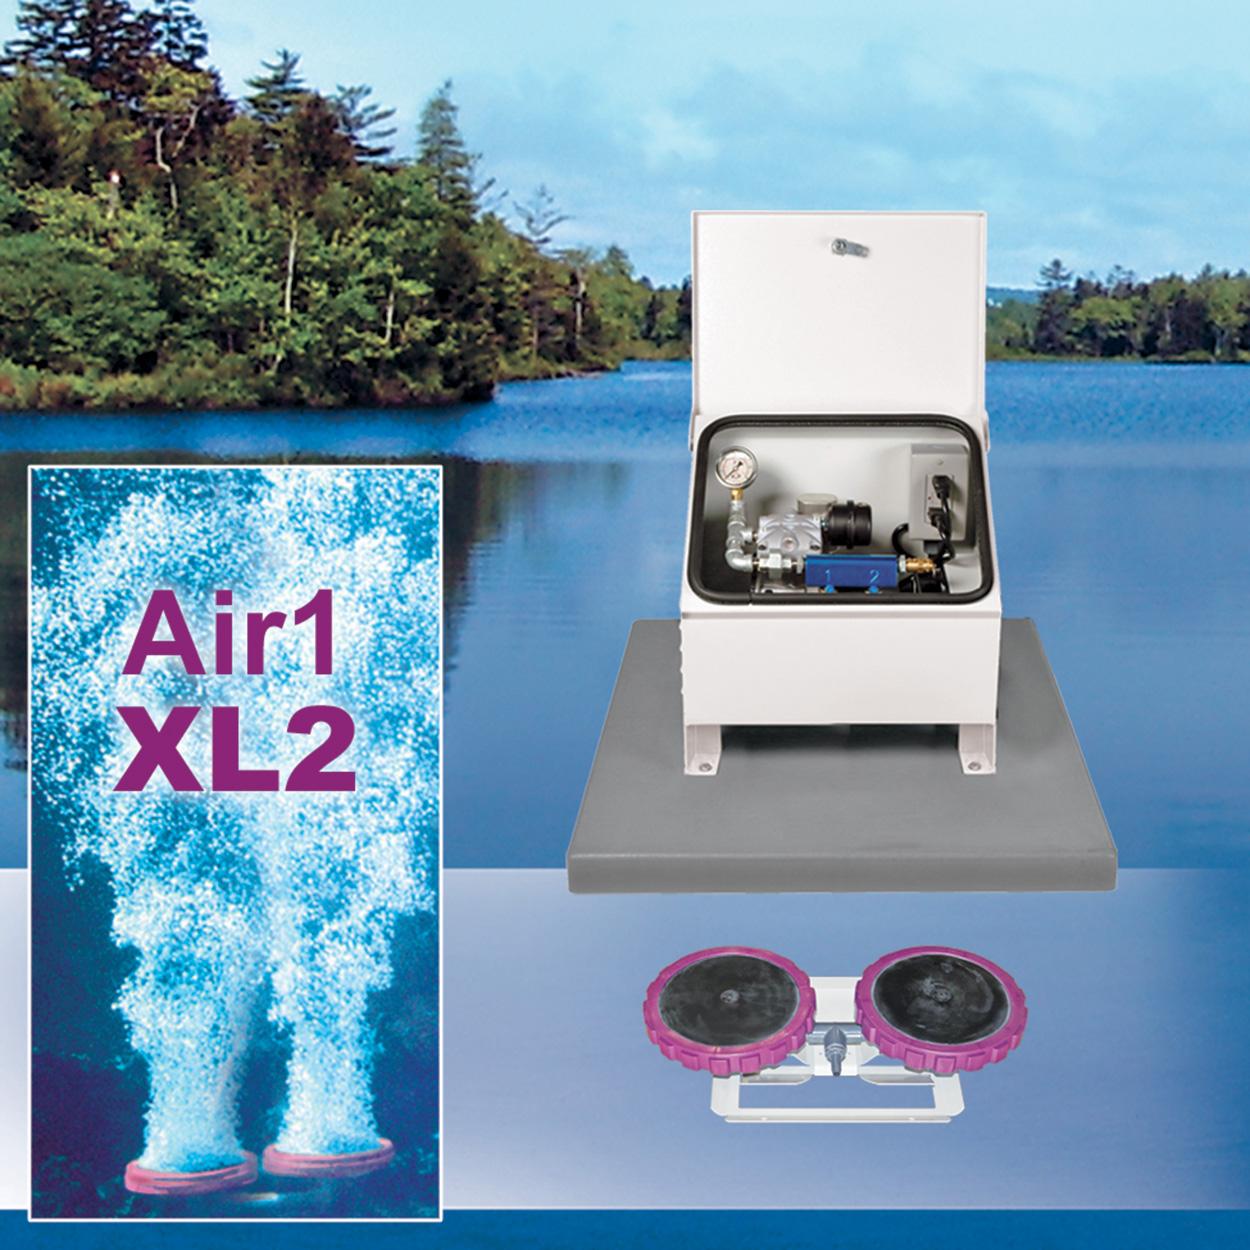 Vertex Air 1 XL2 Aeration System